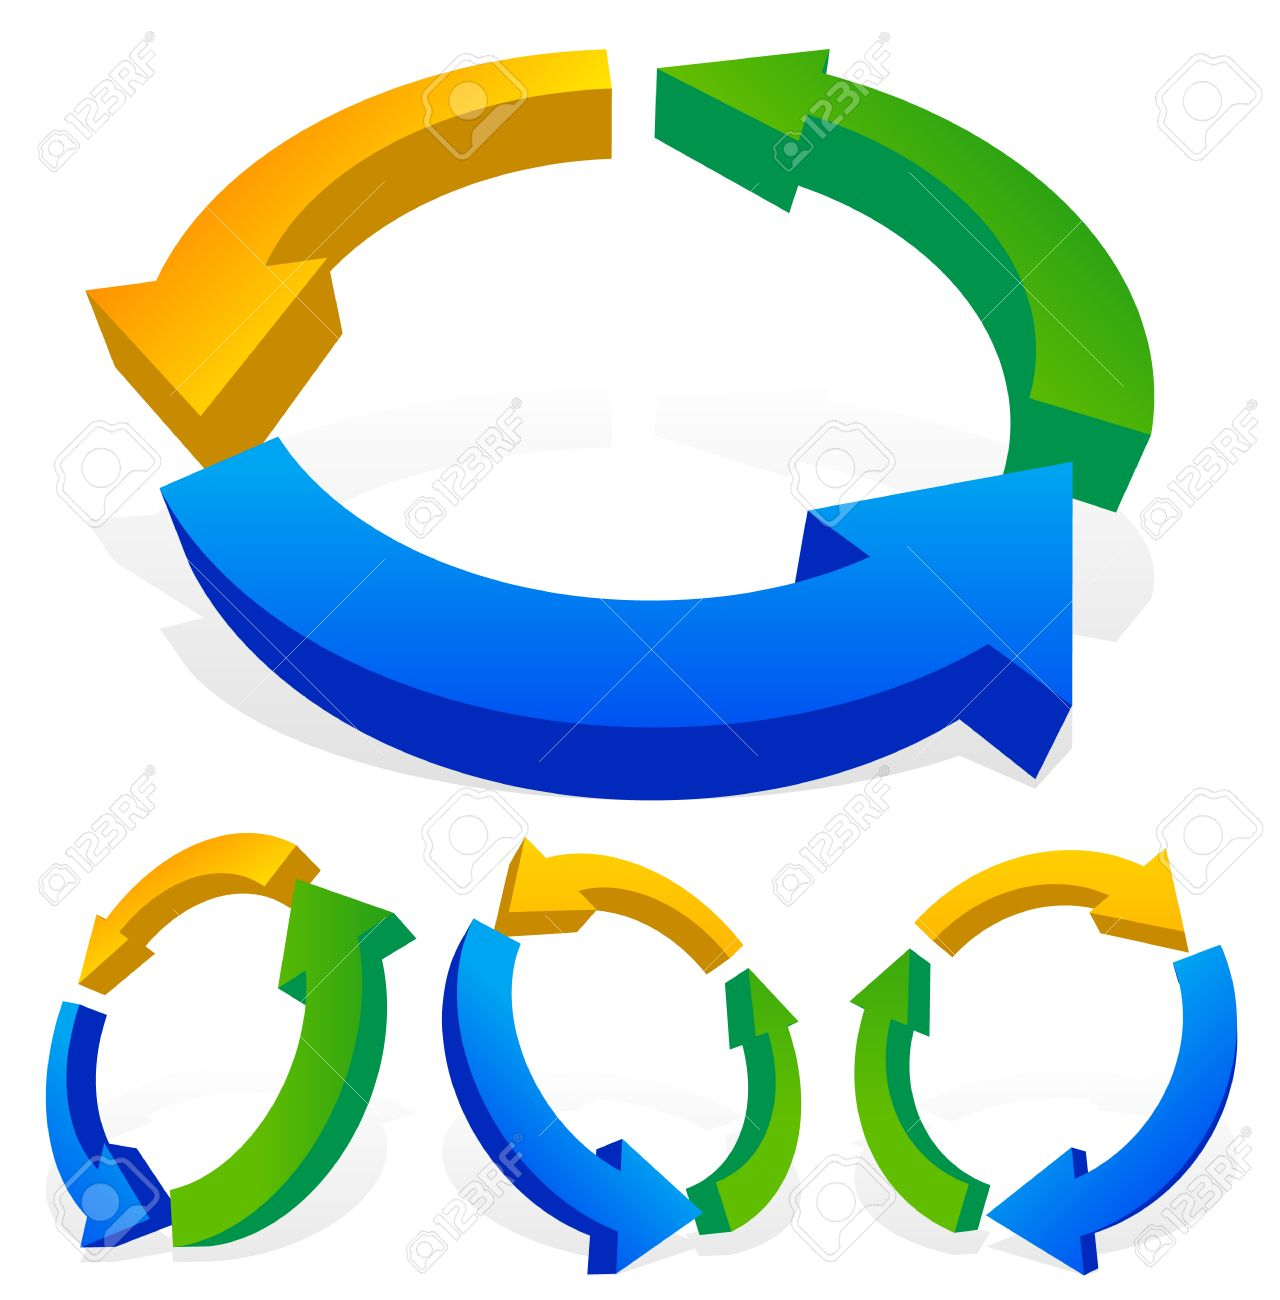 Process cycling arrow by arrow royalty free stock images image - Bold 3d Multicolor Arrows Cycle Loop Process Circulation Cyclic Concepts